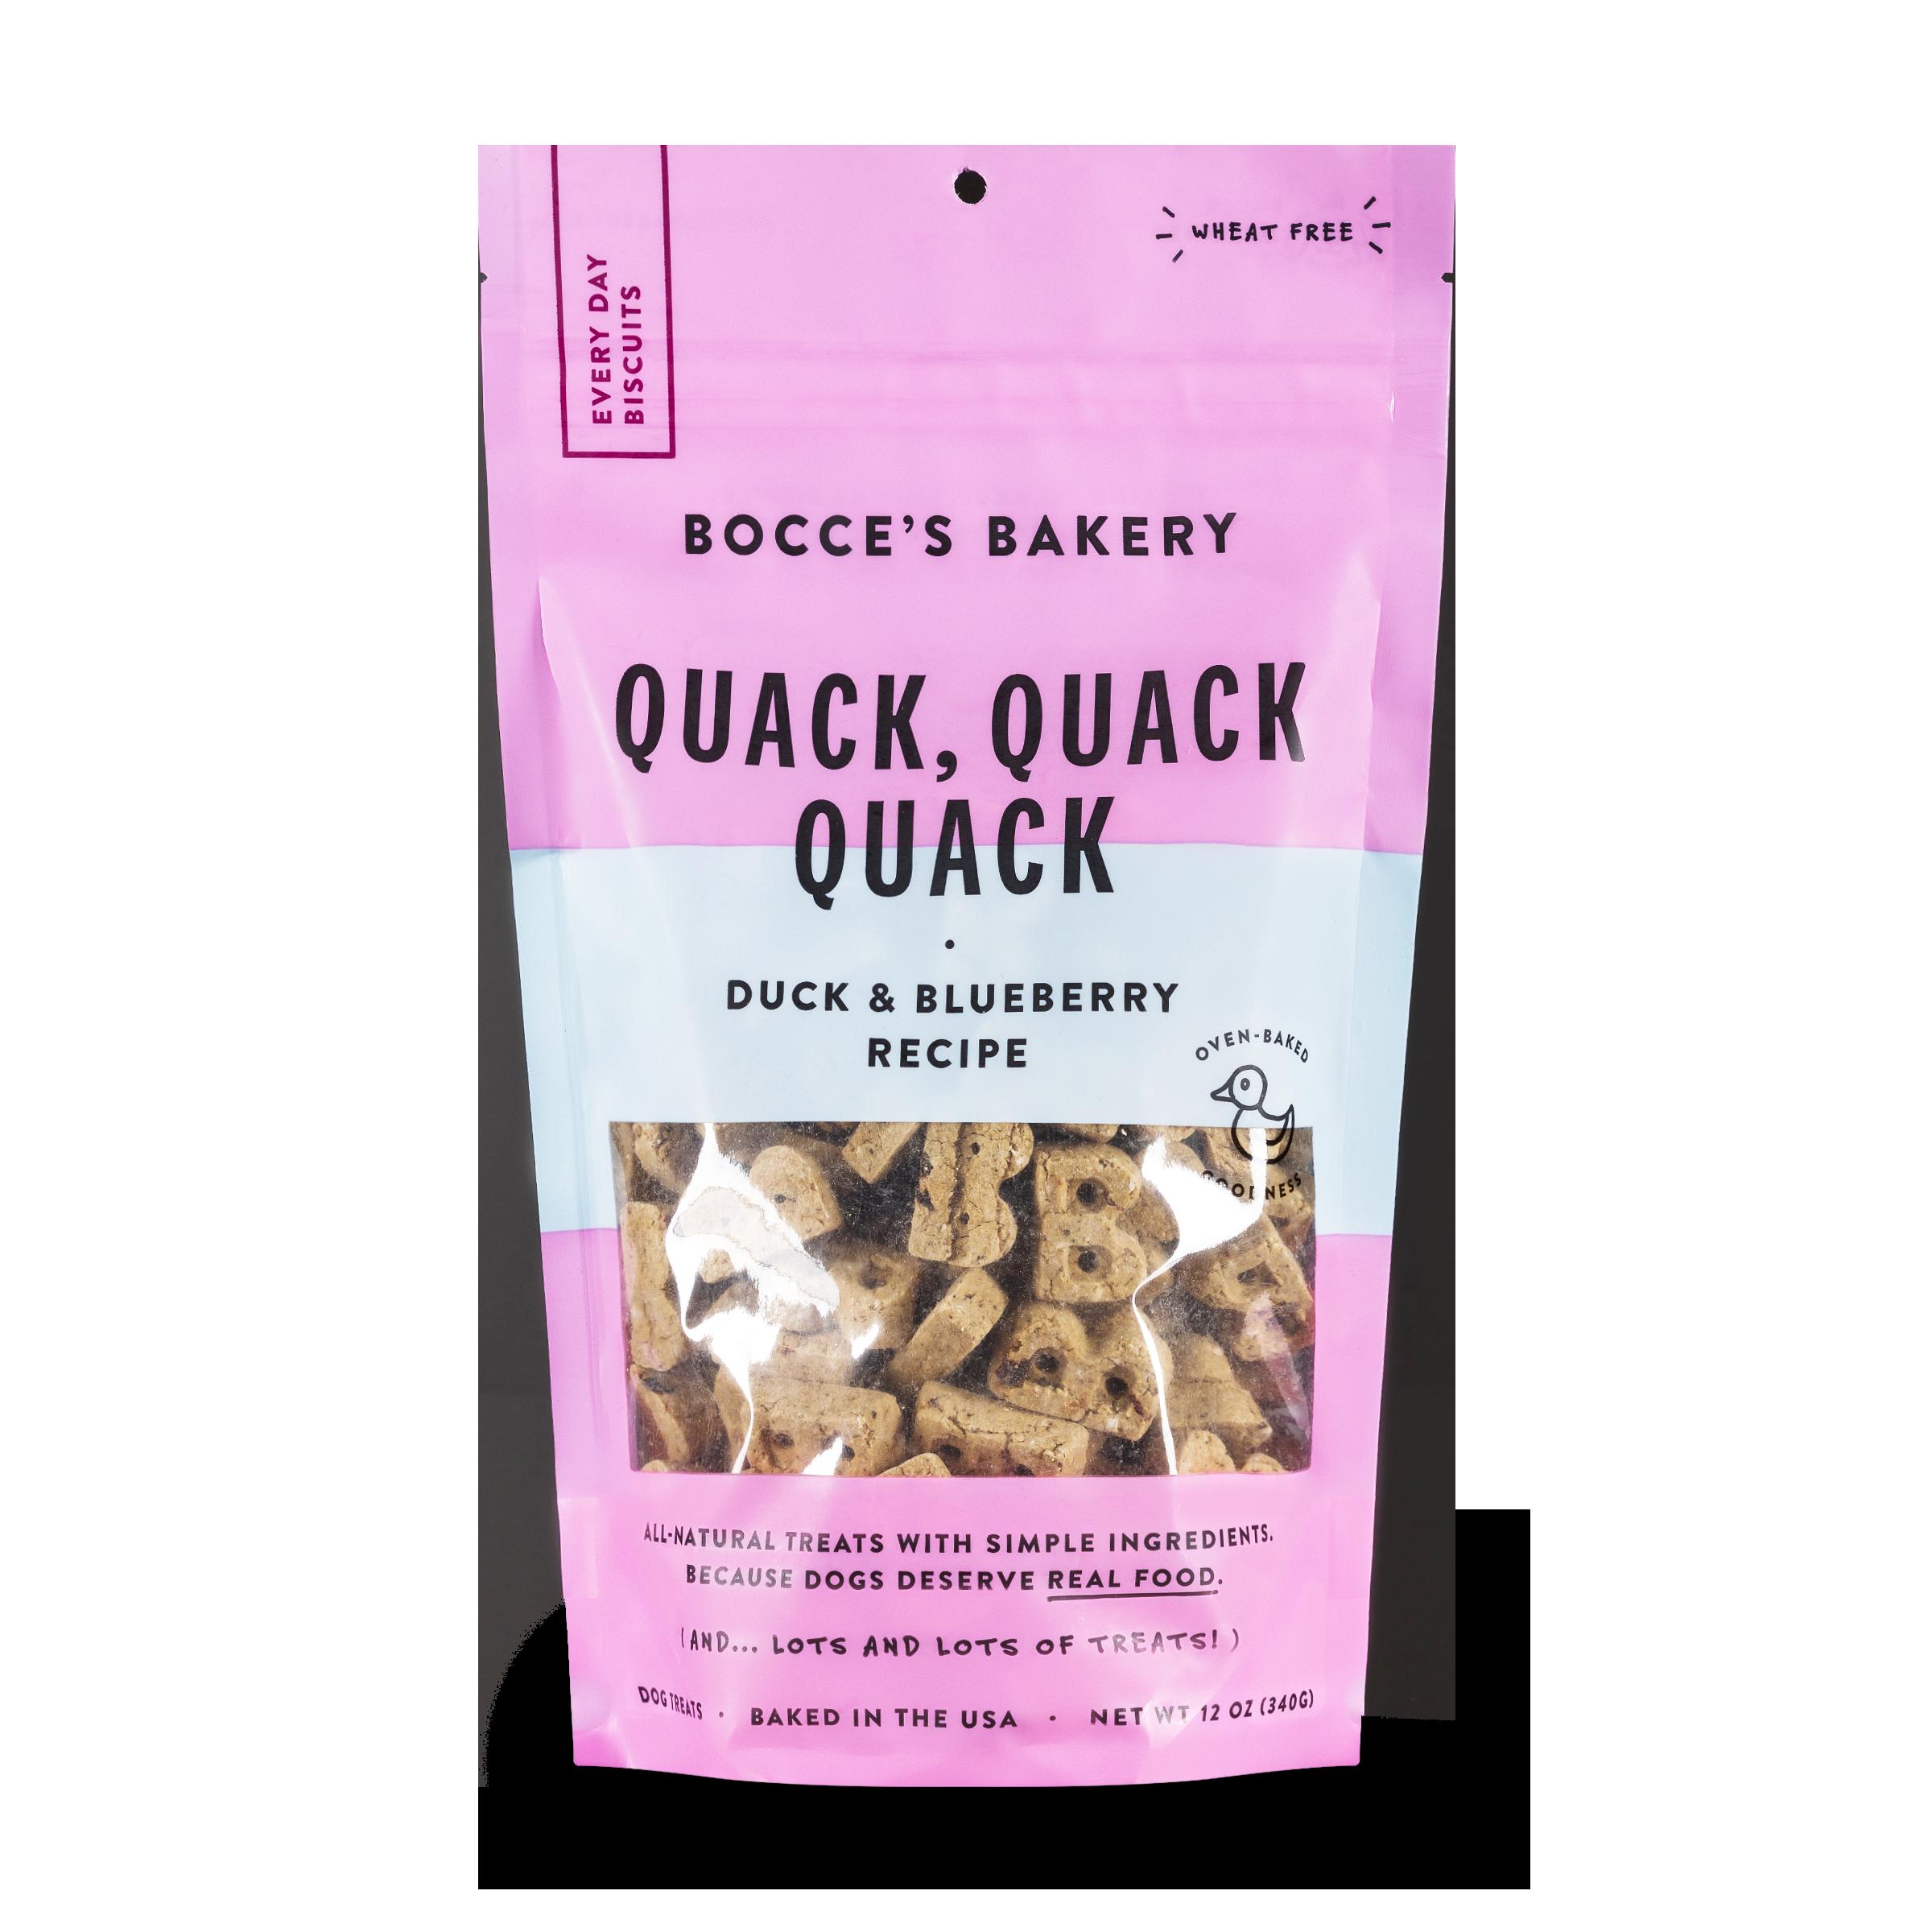 Bocce's Bakery Everyday Quack, Quack, Quack Duck & Blueberries Recipe Biscuit Dog Treats, 12-oz